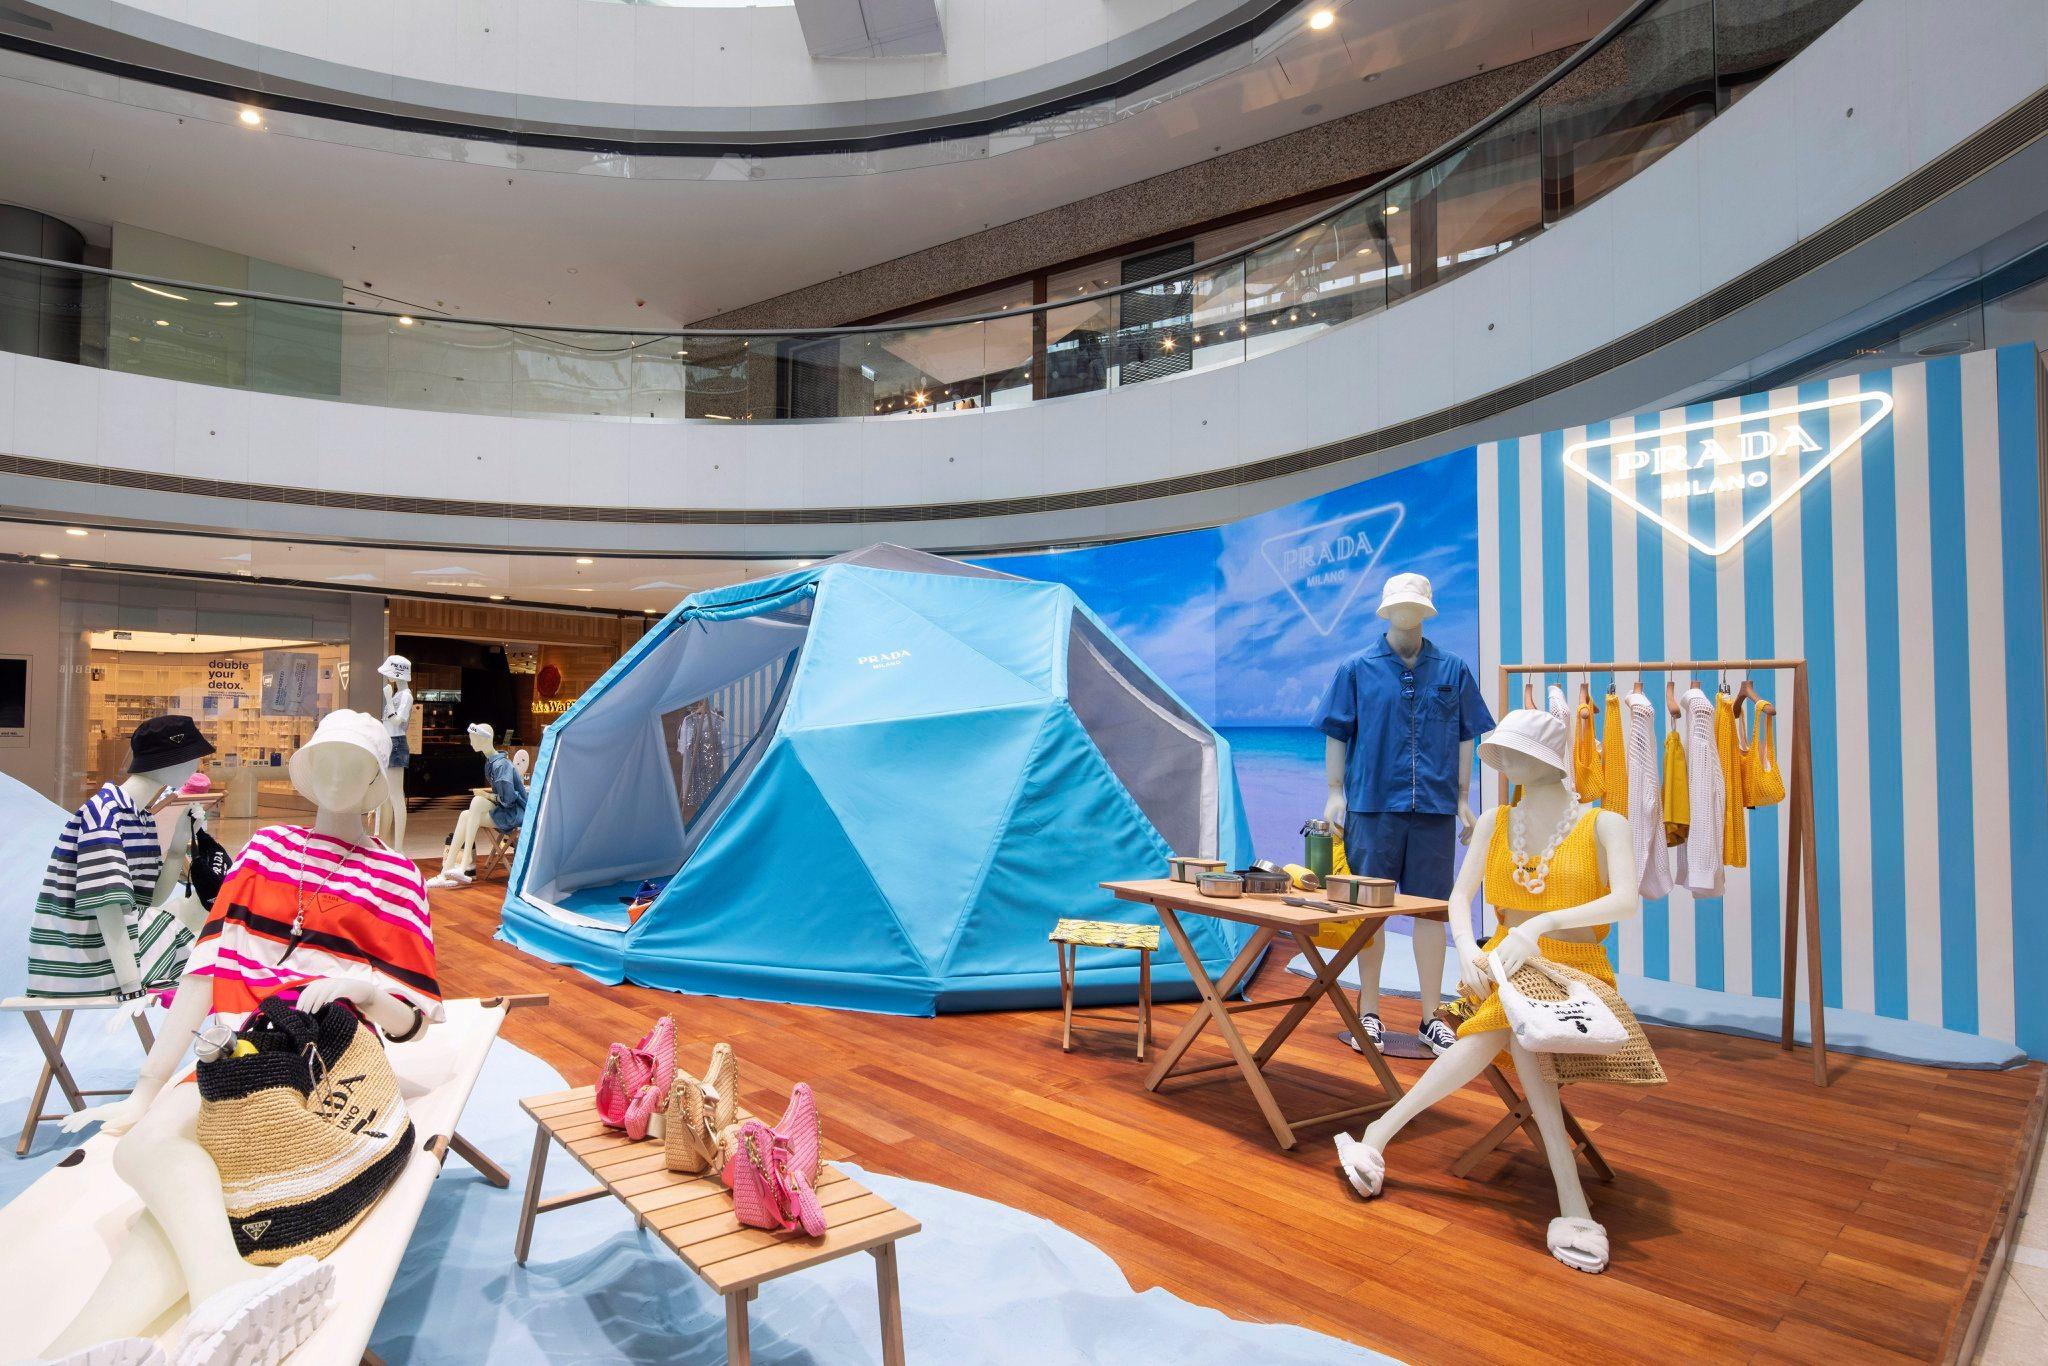 Prada Outdoor 2021 pop-up at Mall of Emirates, Dubai